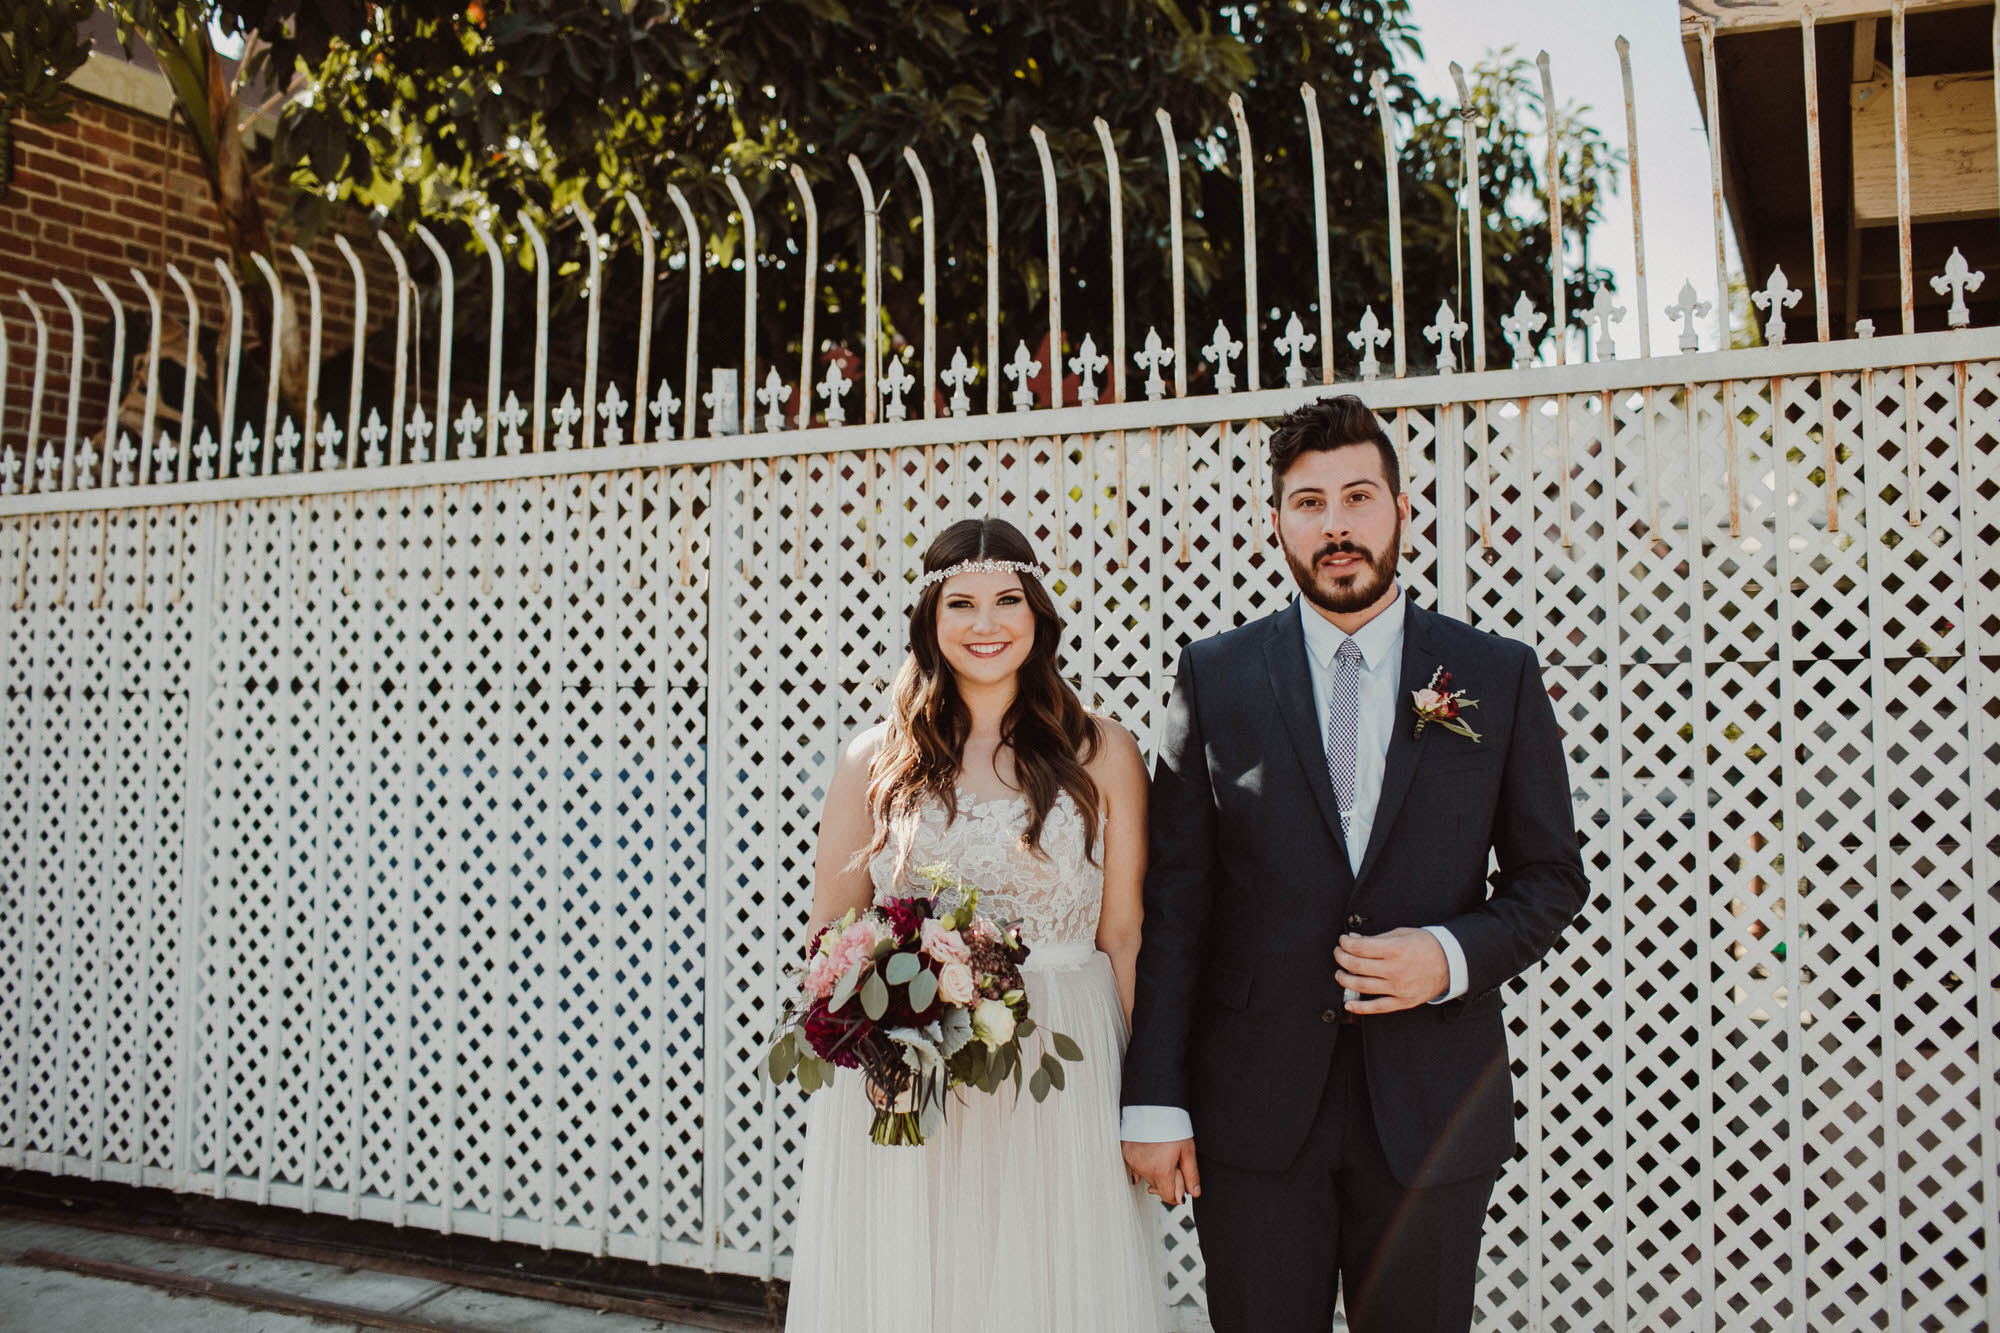 los-angeles-wedding-photographer-kristen-dylan-48.jpg